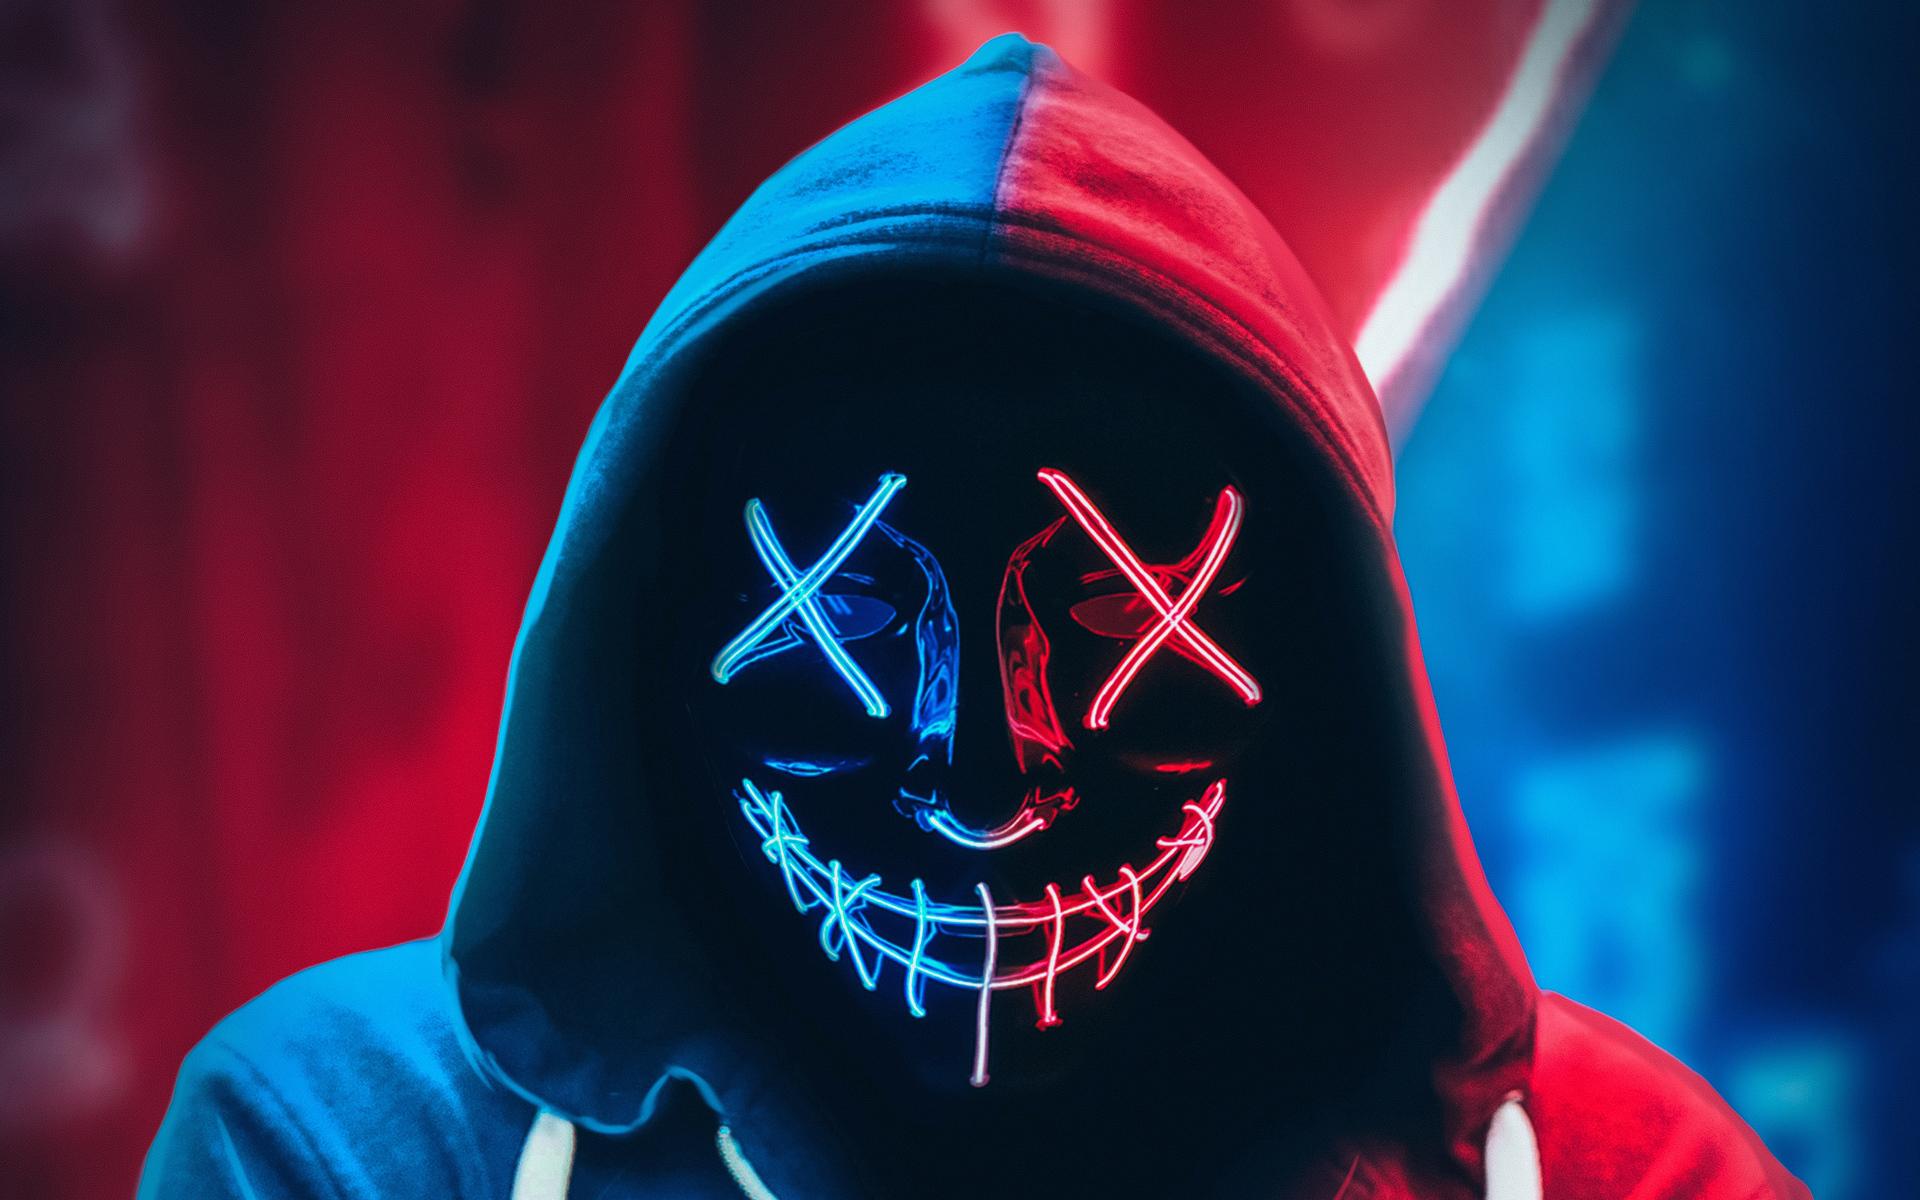 1920x1200 Neon Mask Hoodie 4k 1080P Resolution HD 4k ...